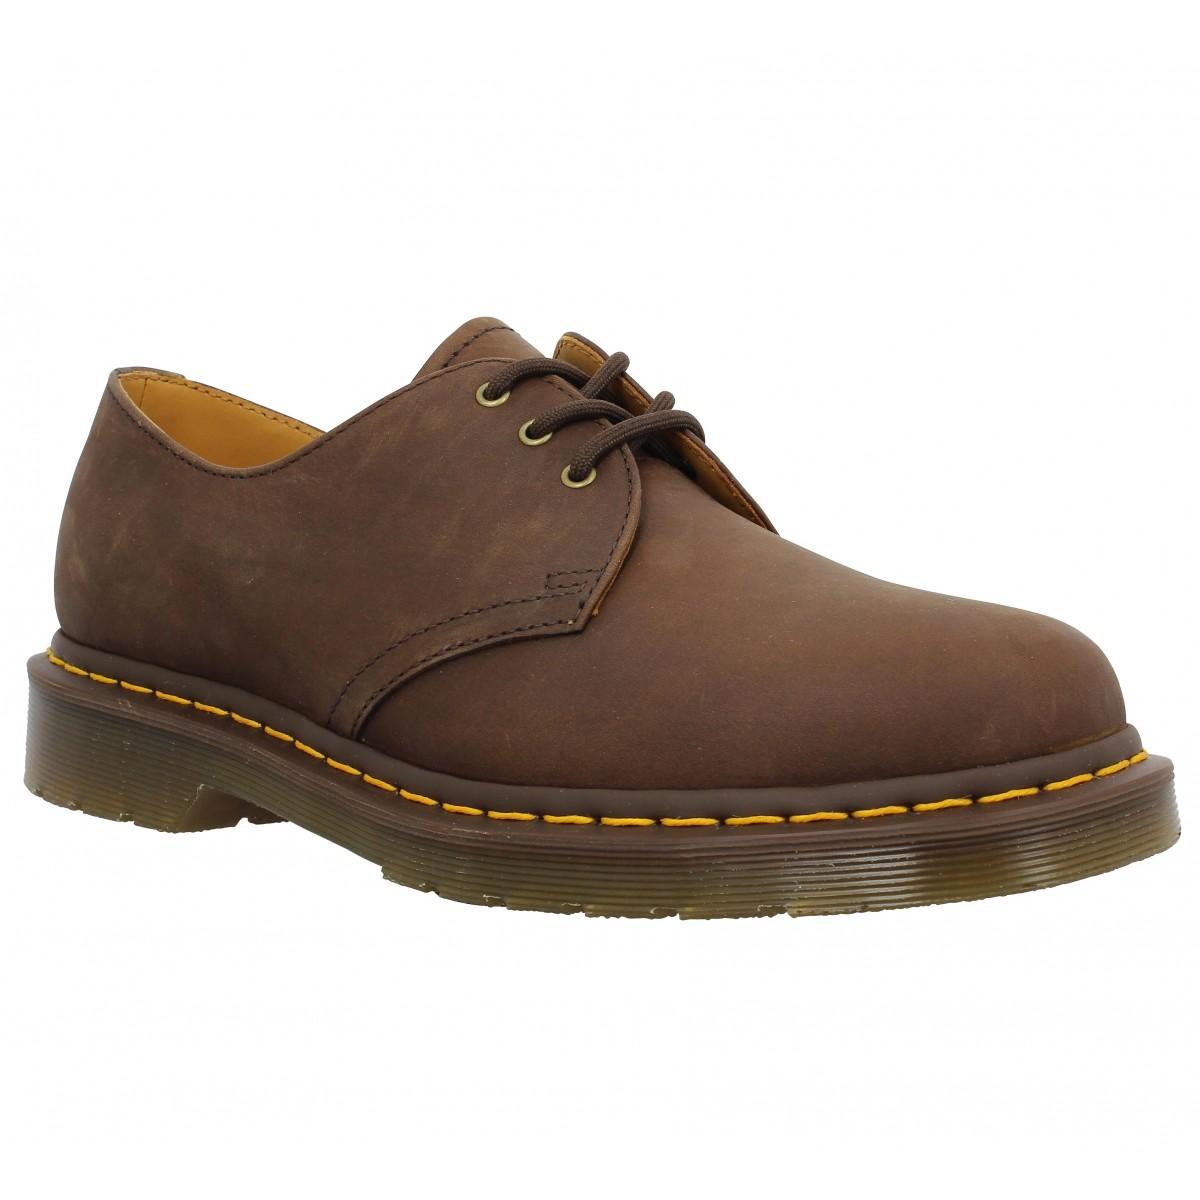 dr martens chaussures pour homme vente en ligne. Black Bedroom Furniture Sets. Home Design Ideas